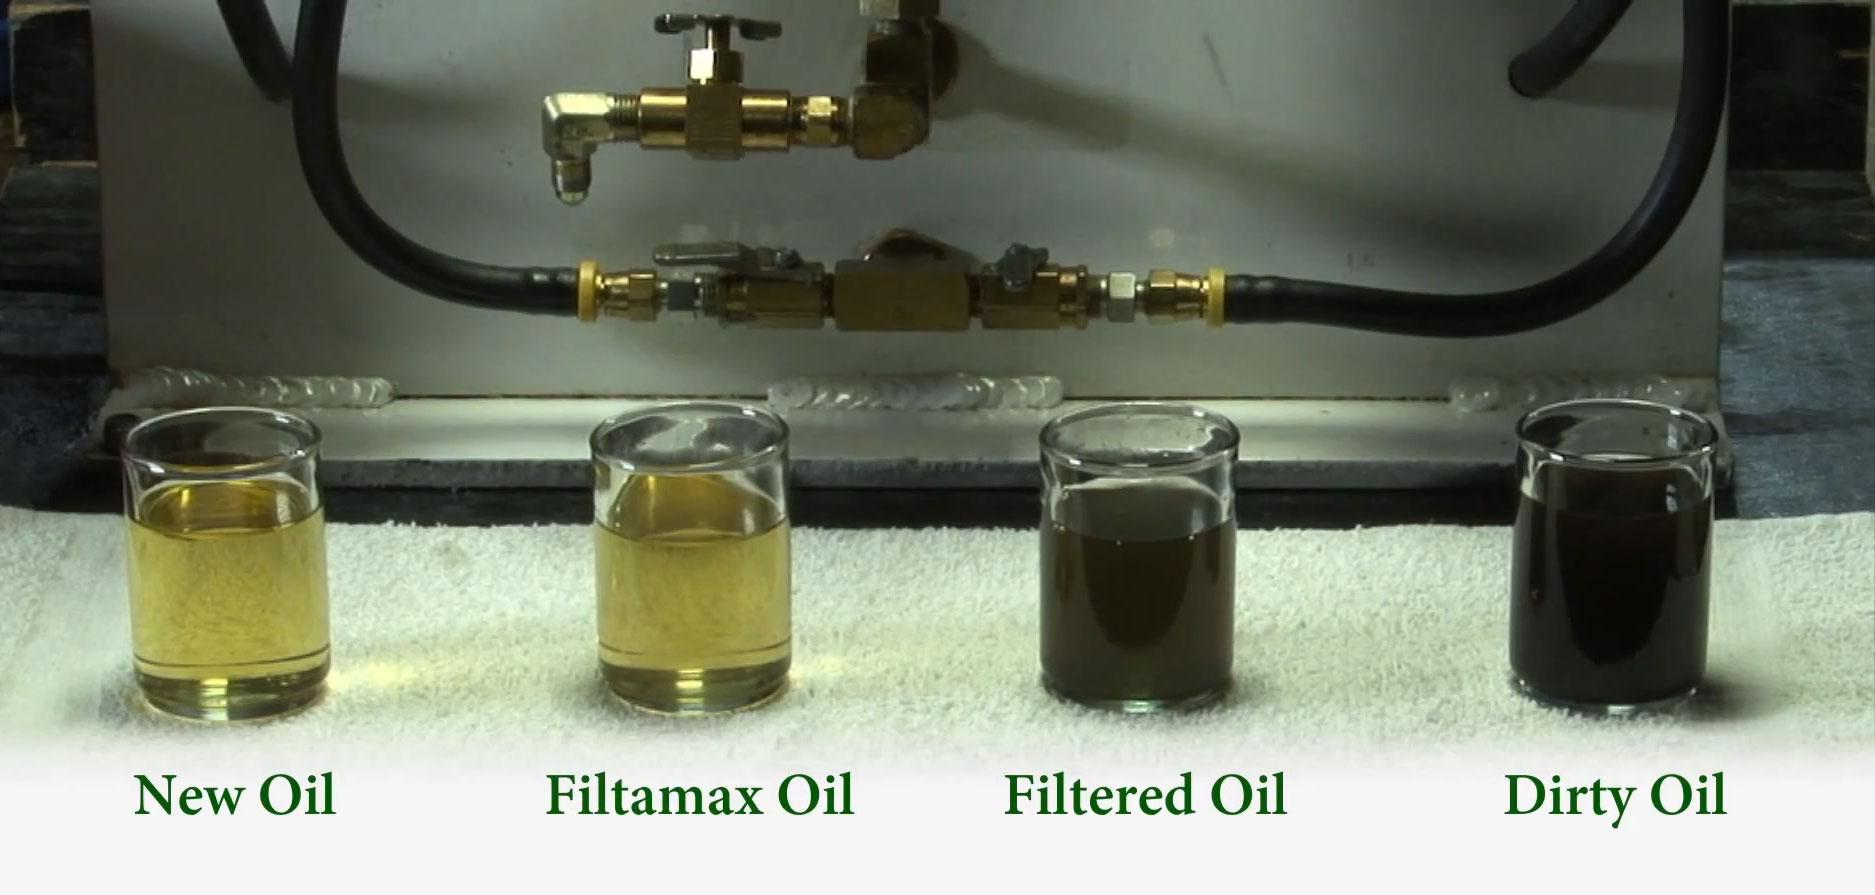 oil.jpg (158 KB)